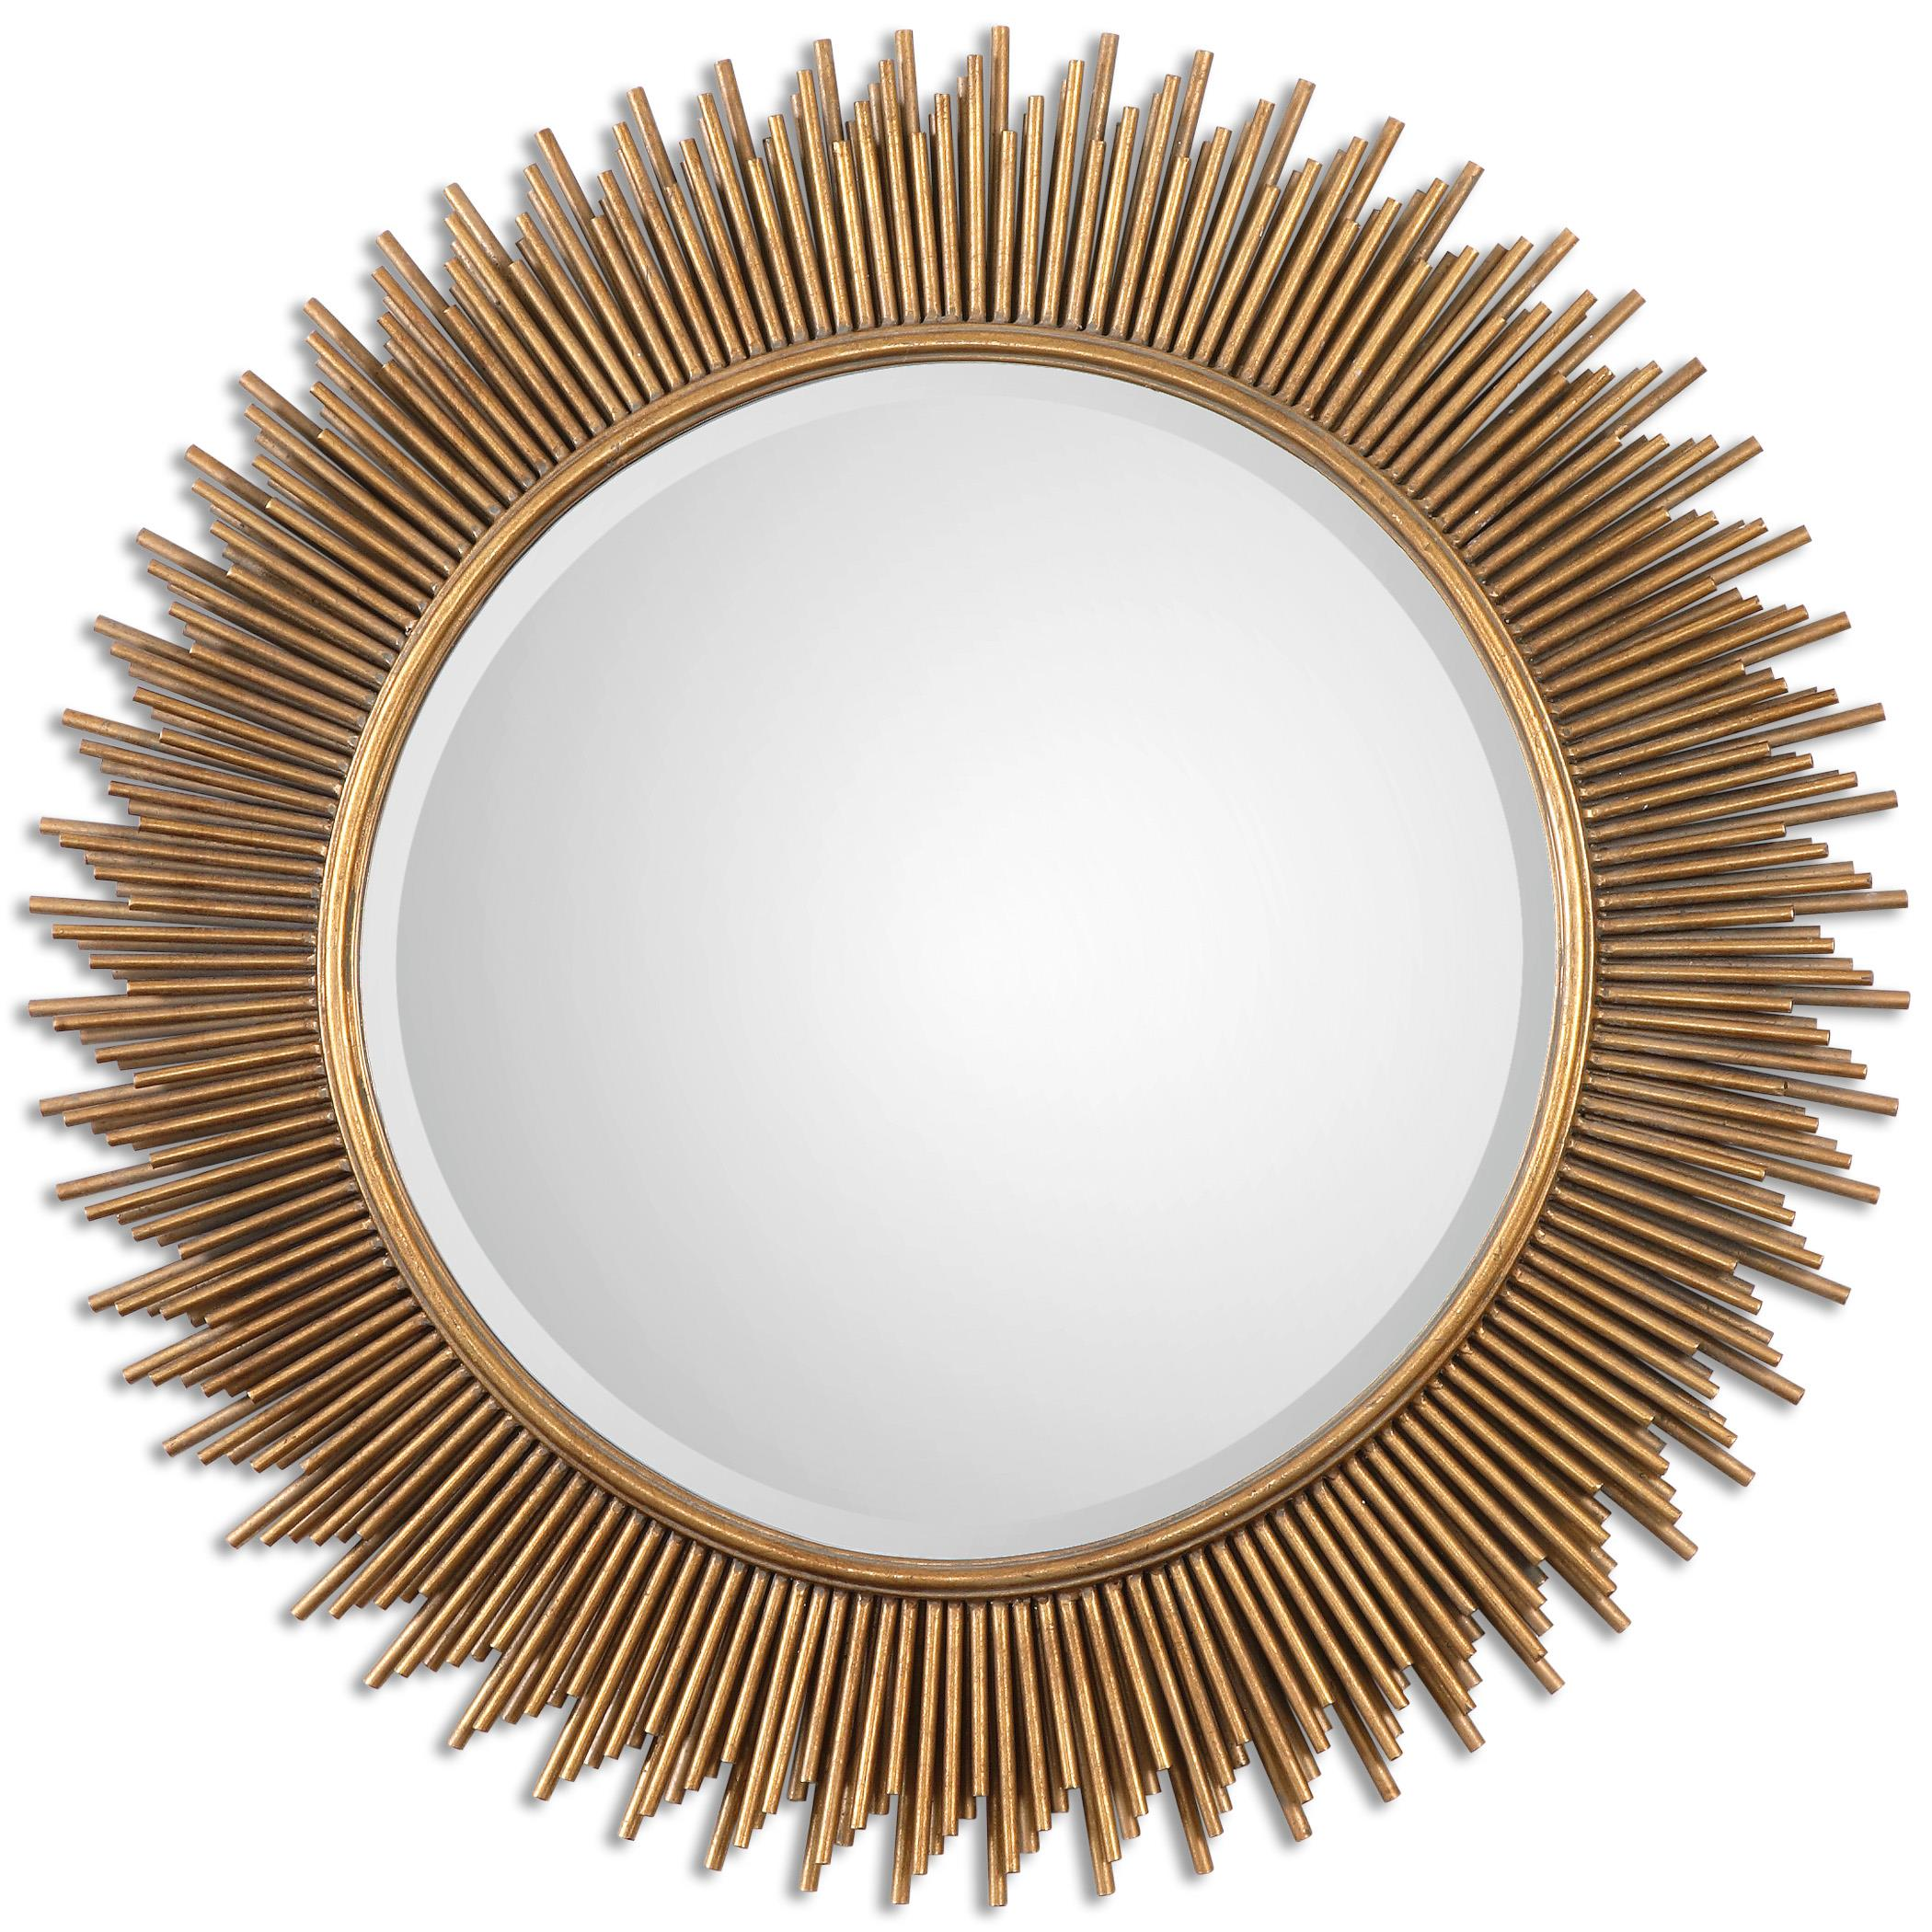 Mirrors - Round Marlo Round Gold Mirror by Uttermost at Miller Waldrop Furniture and Decor